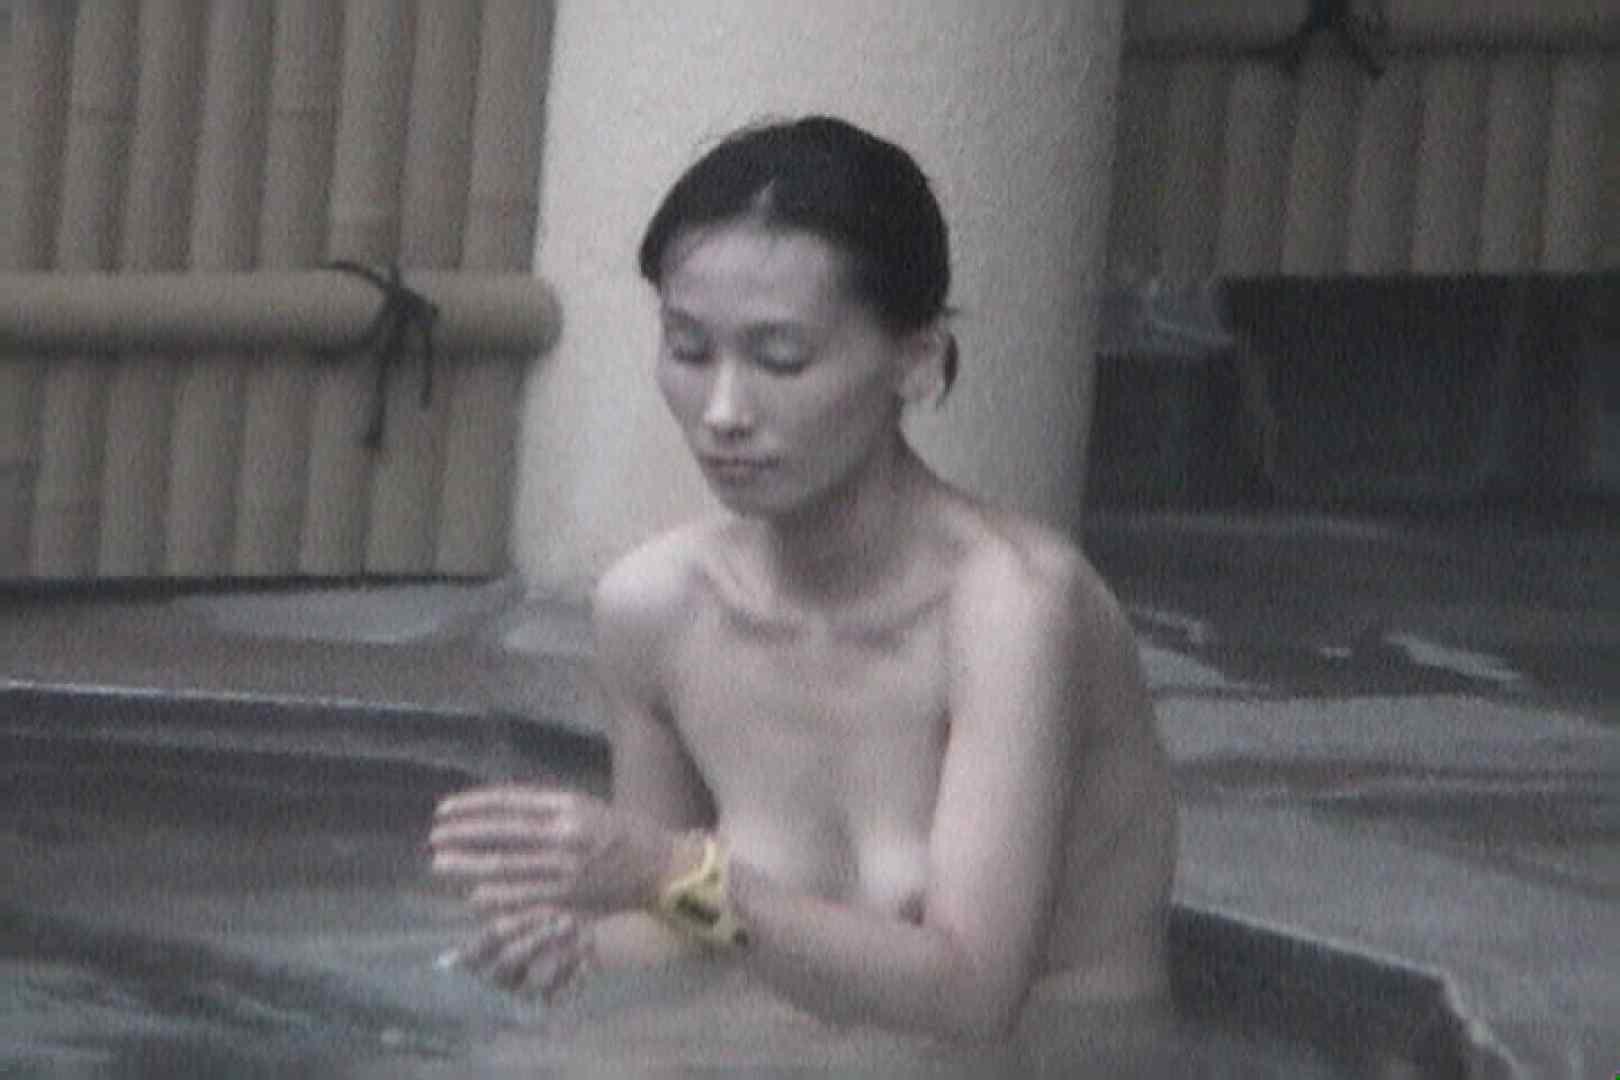 Aquaな露天風呂Vol.557 露天  40連発 6